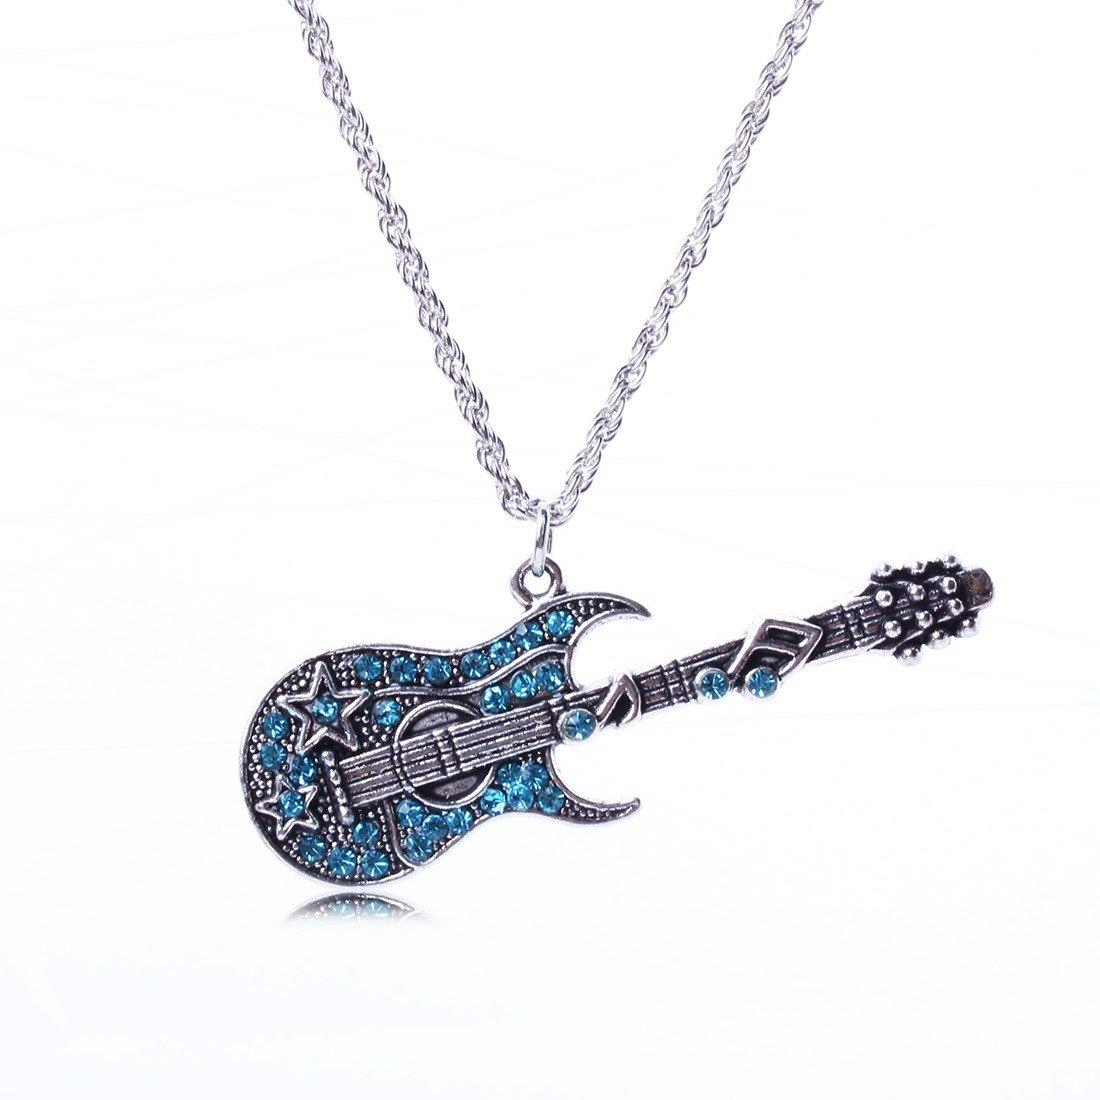 Qiyun Bling Blue Rhinestone Cute Guitar White K Link Chain Pendant Necklace Guitare Bleue K Blanc Lien Collier W005N1685